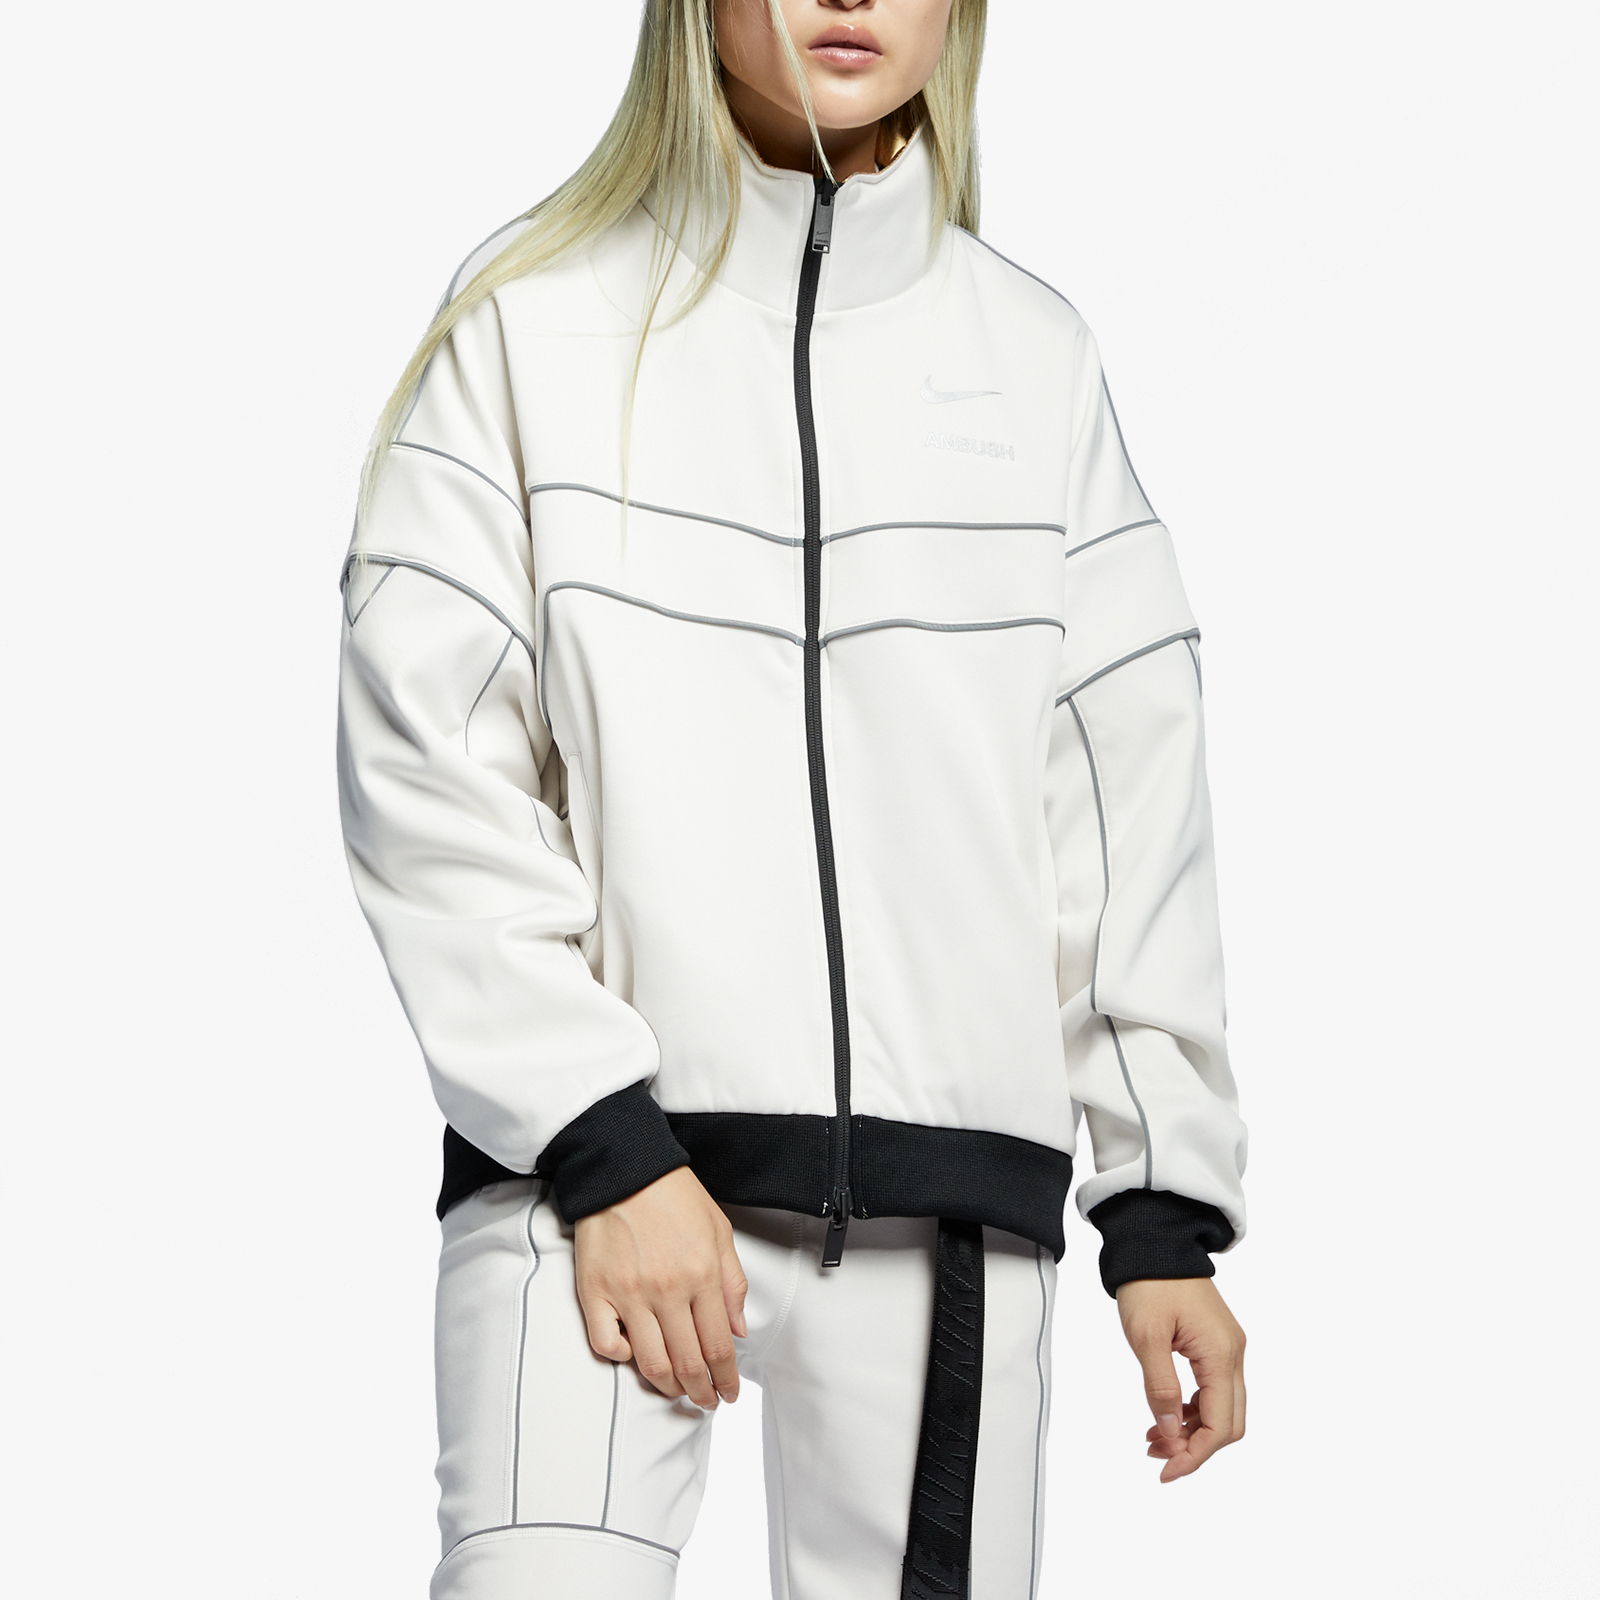 Nike W NRG Ca Midlayer Aq9228 030 Sneakersnstuff